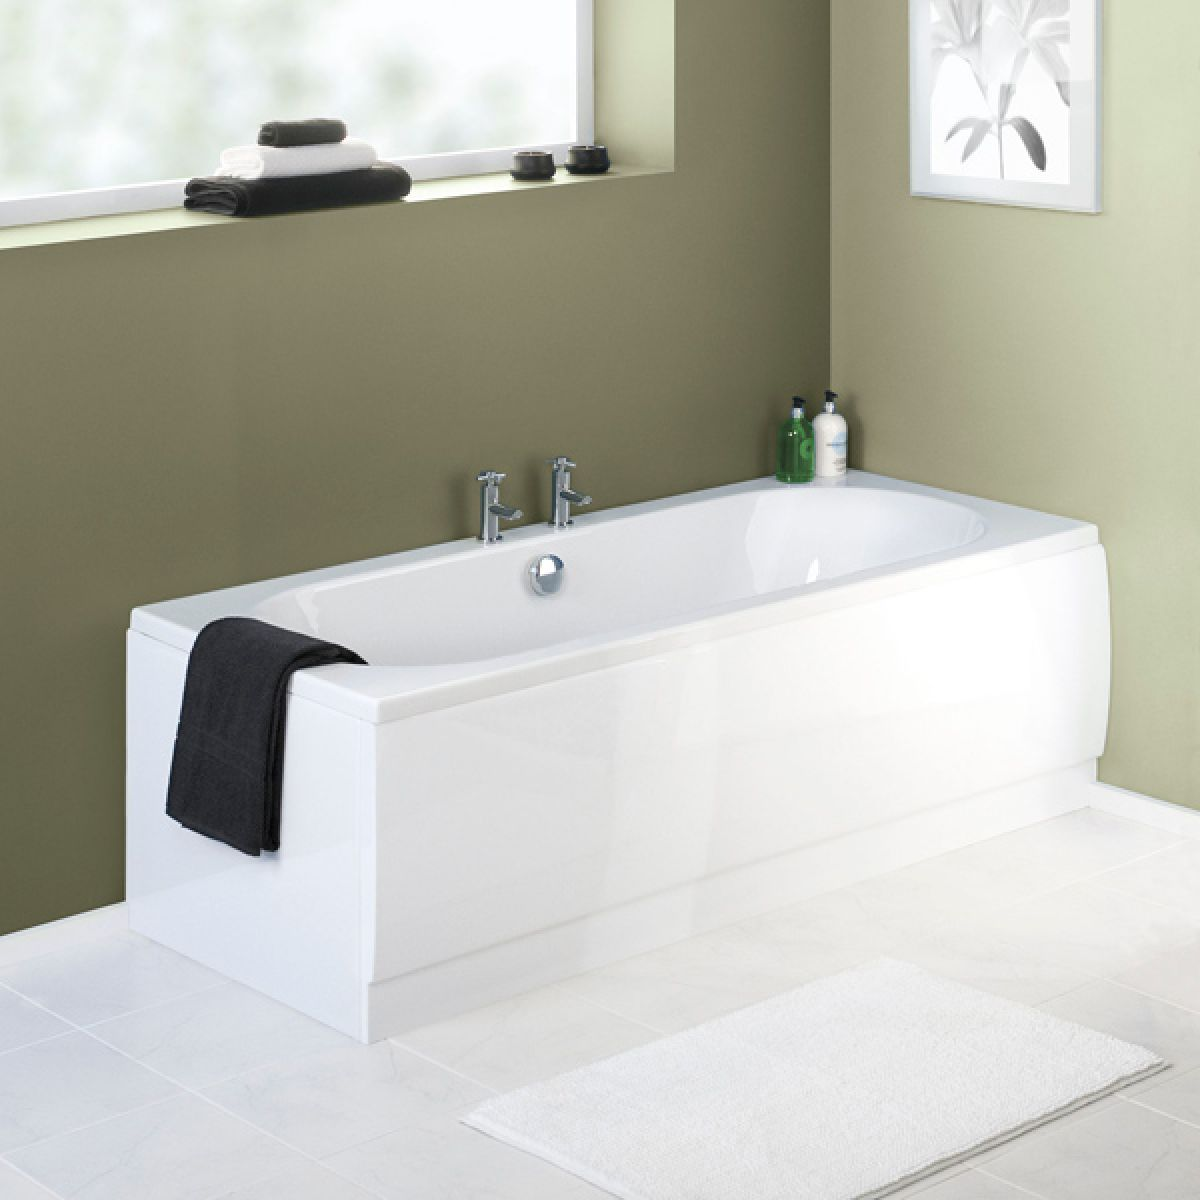 Premier Acrylic Front Bath Panel